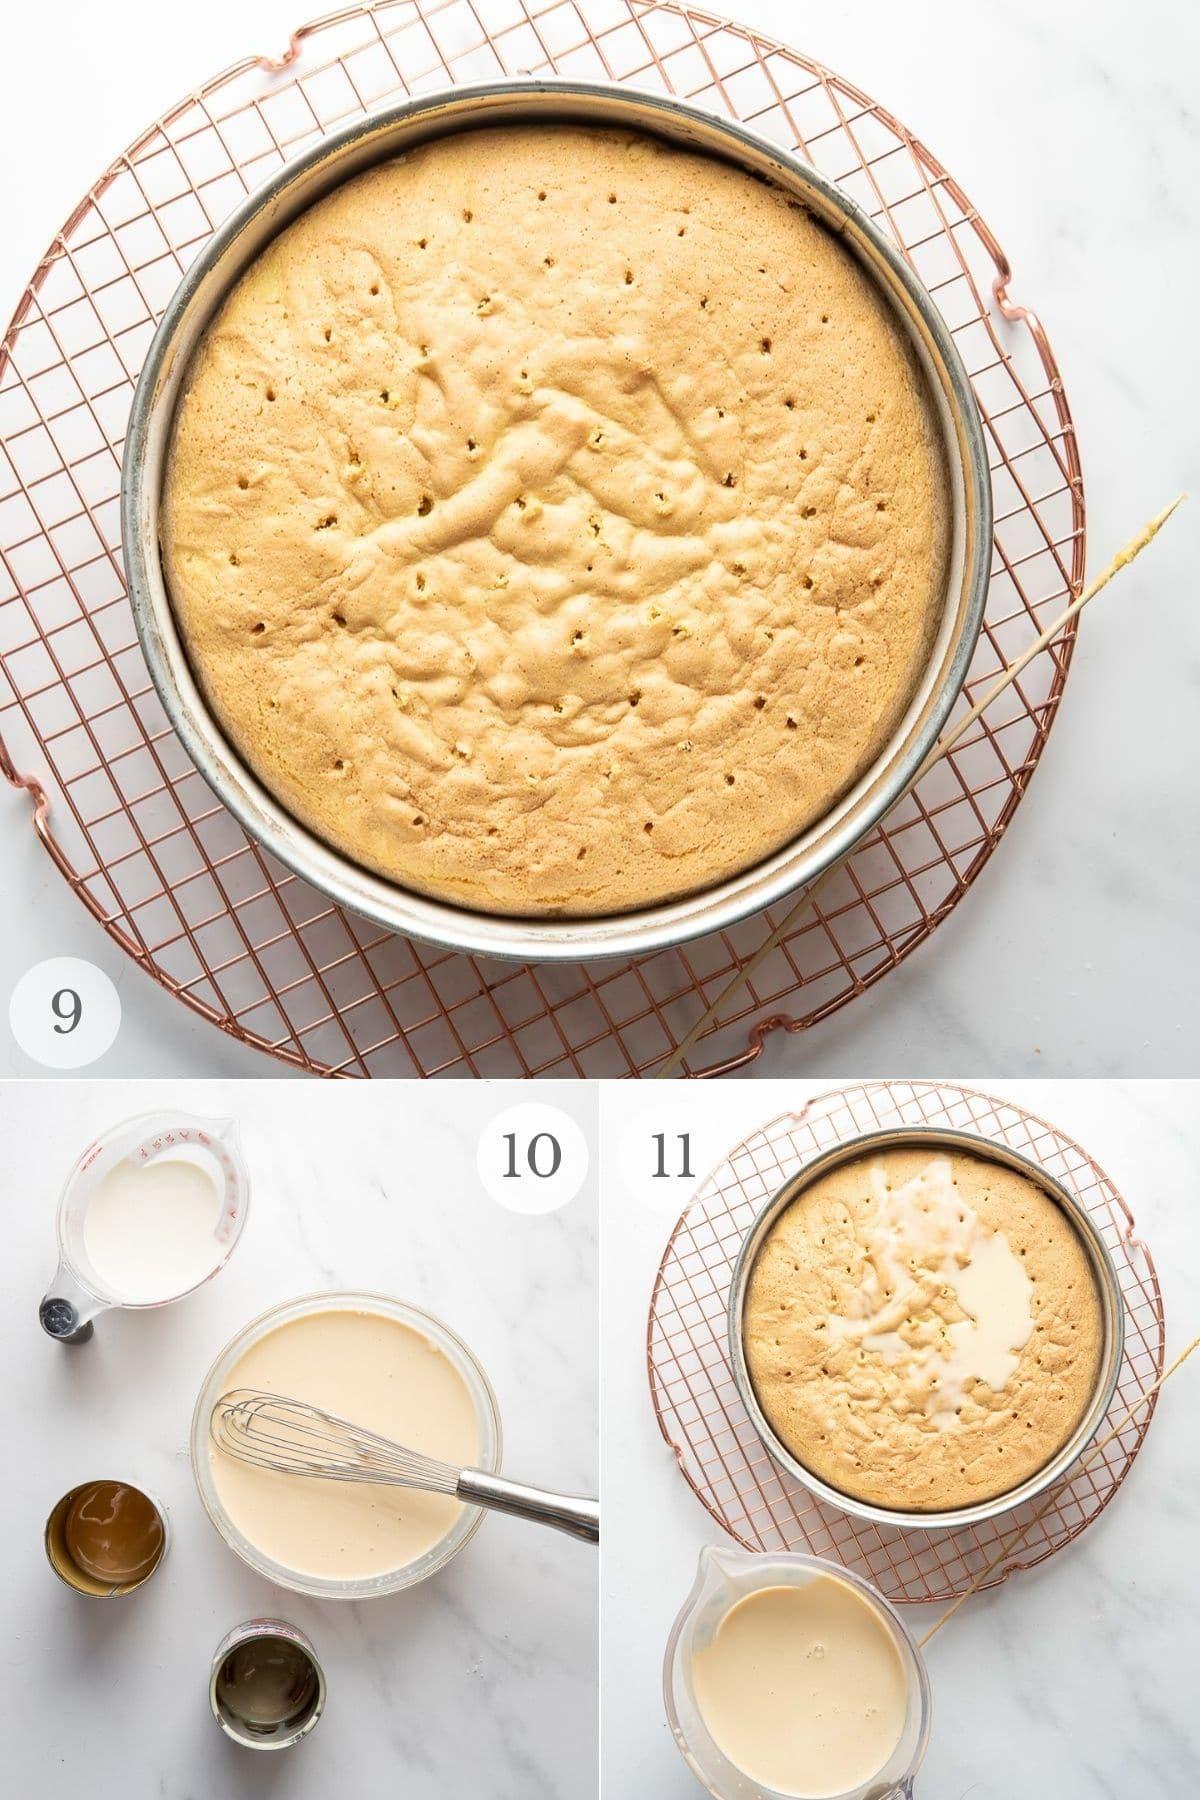 tres leches cake recipe steps 9-11